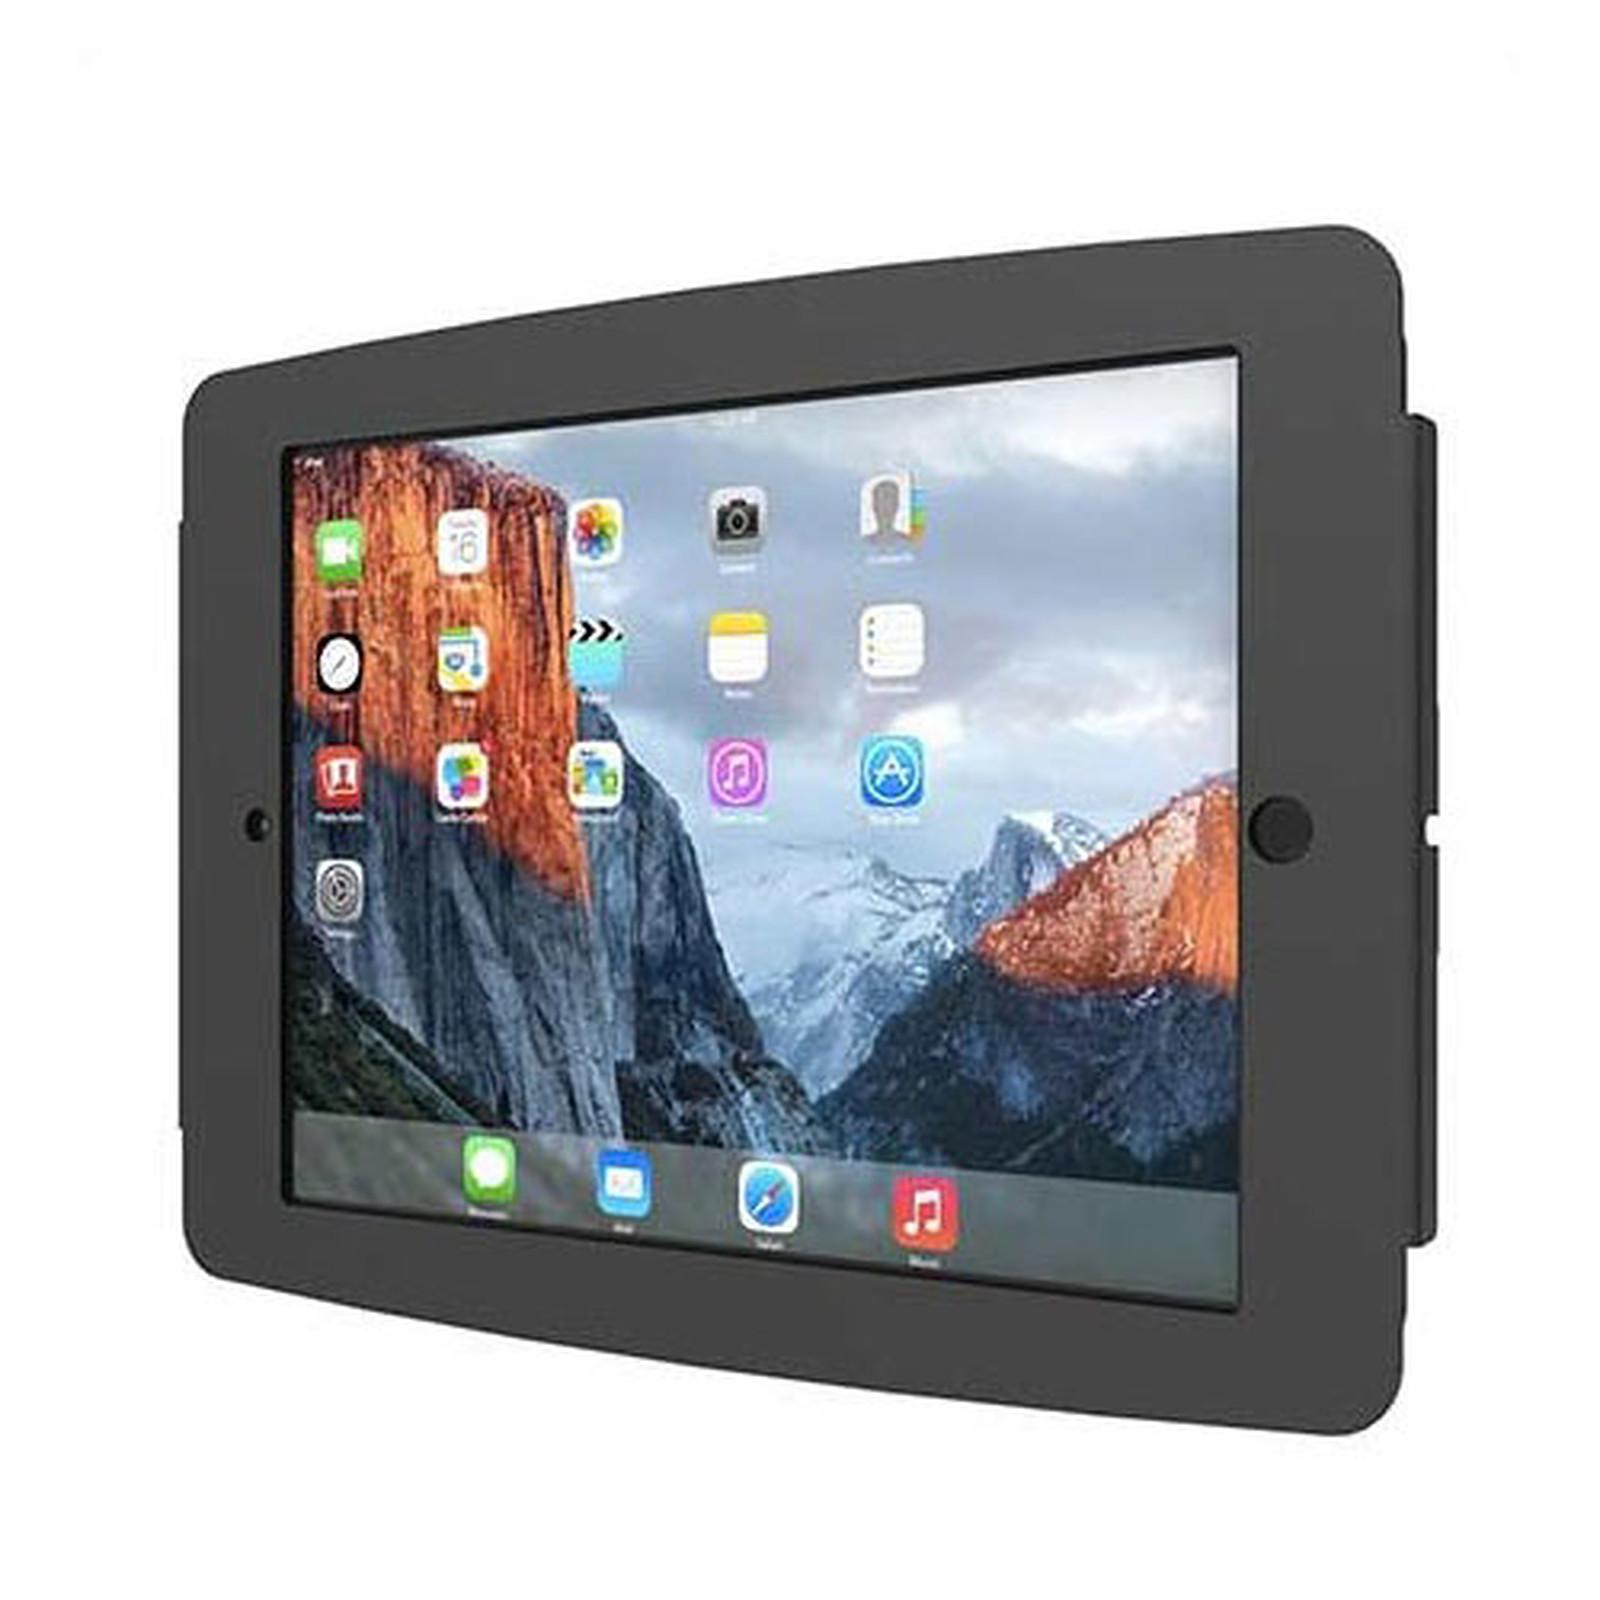 Maclocks Space iPad Pro Enclosure Wall Mount Noir